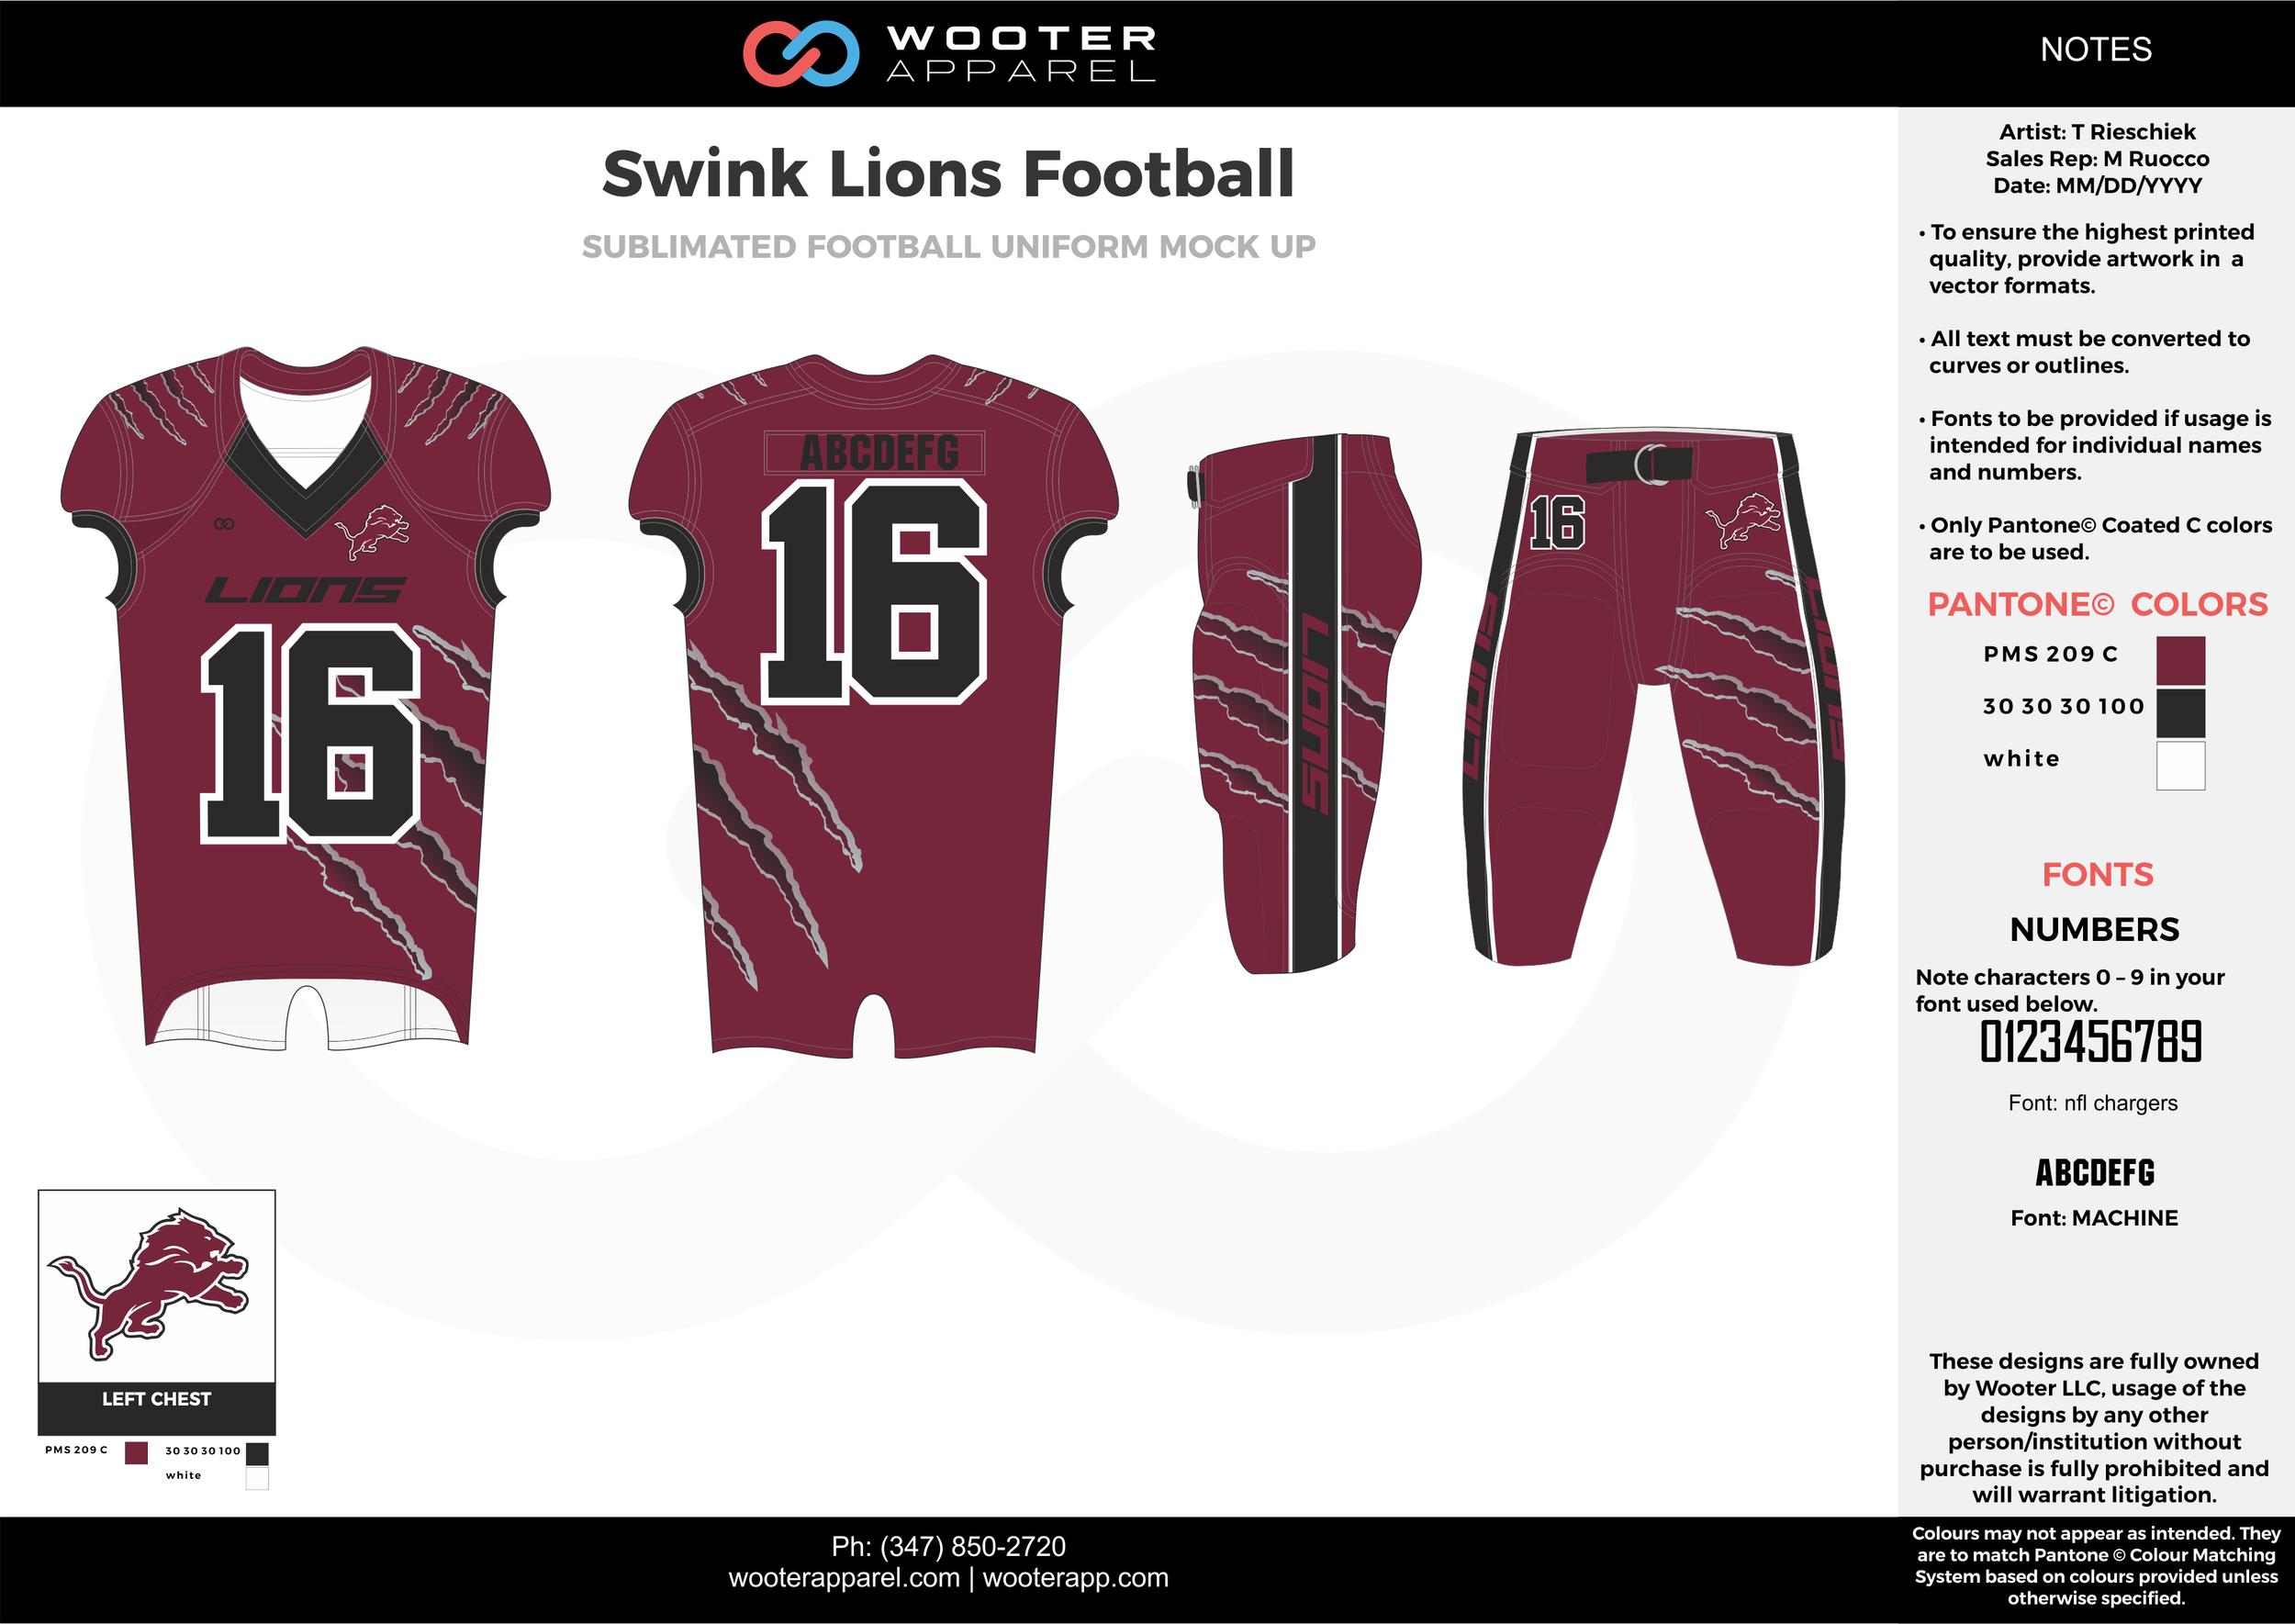 Swink Lions Football maroon black white football uniforms jerseys pants